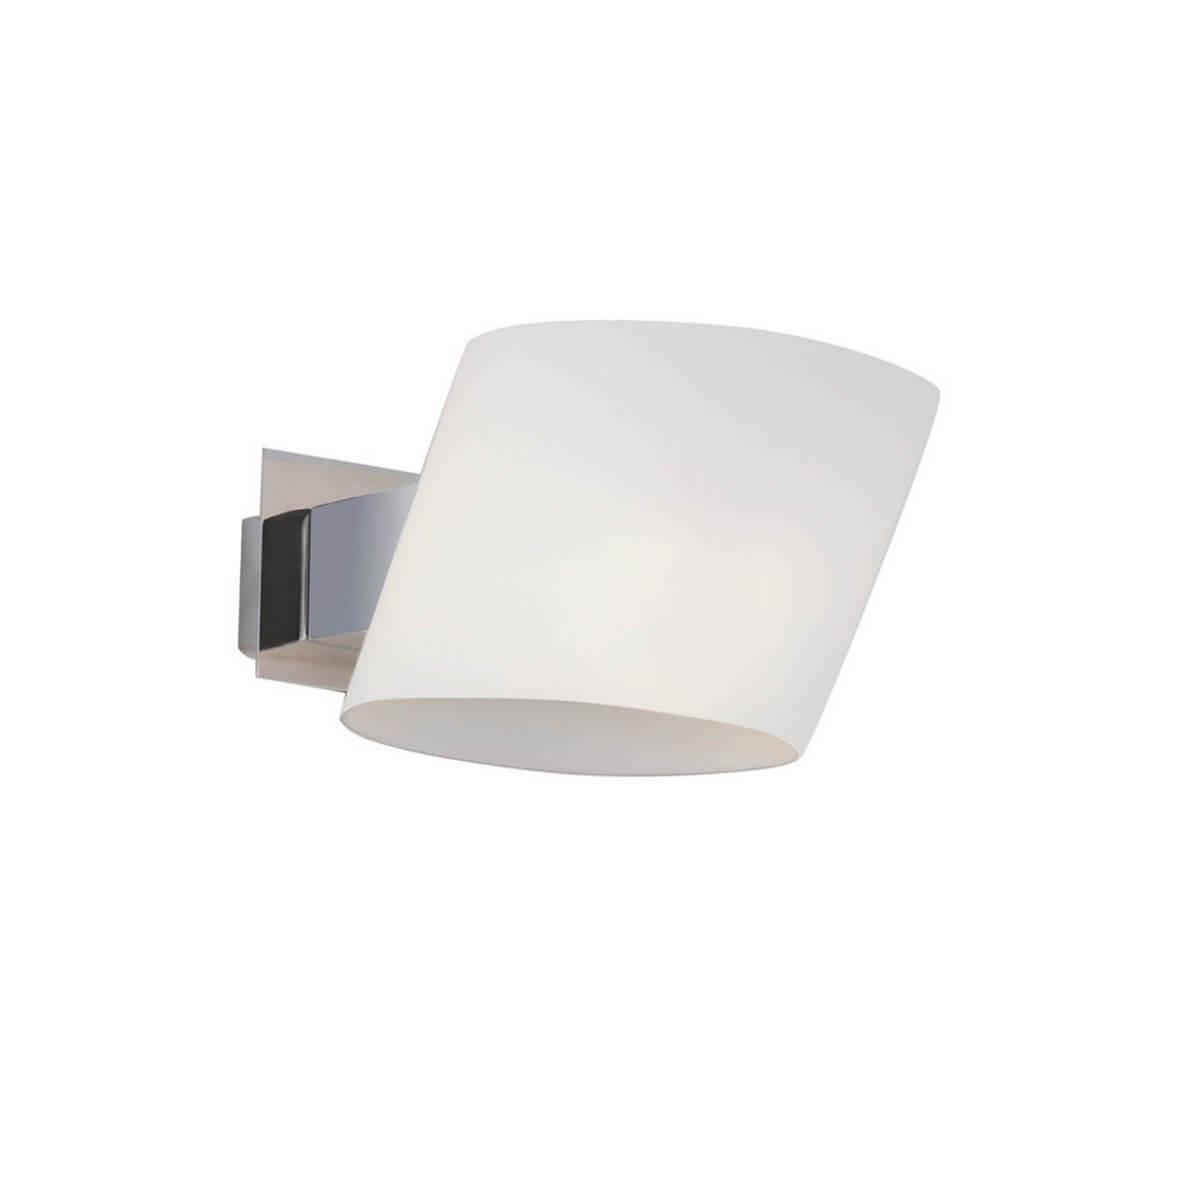 лучшая цена Бра Lightstar 803610, G9, 40 Вт